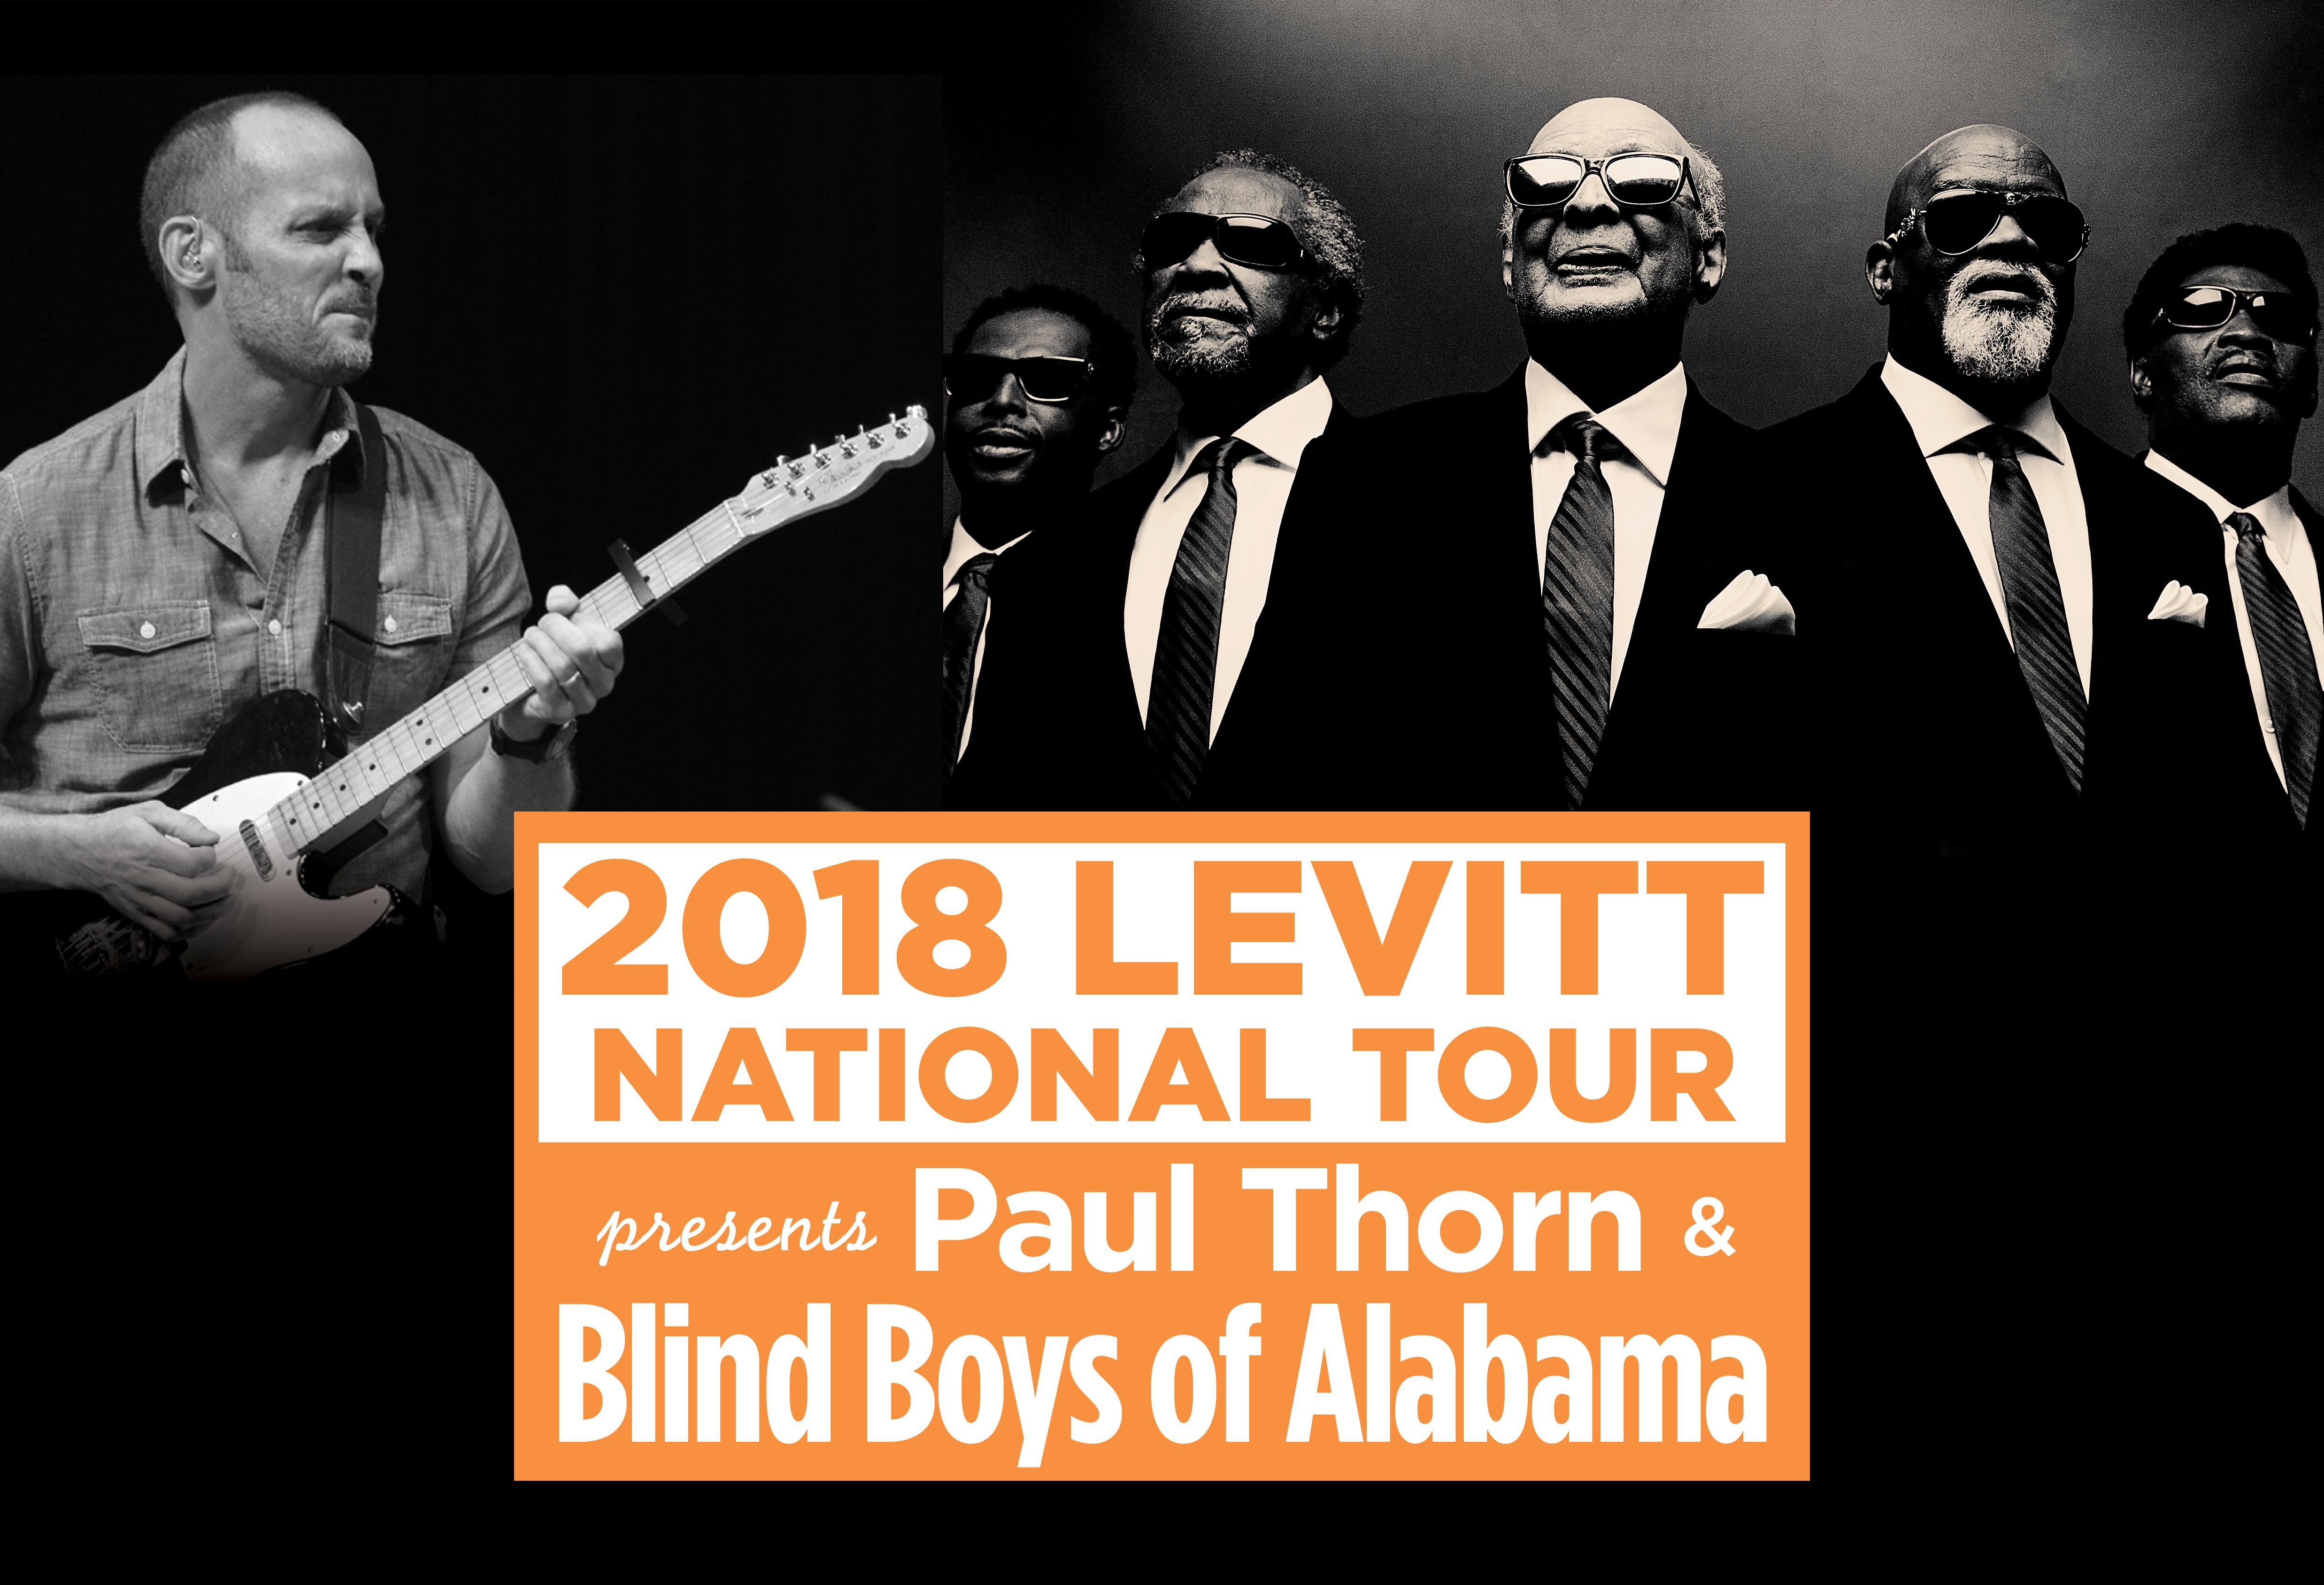 Paul Thorn and Blind Boys of Alabama to headline Levitt